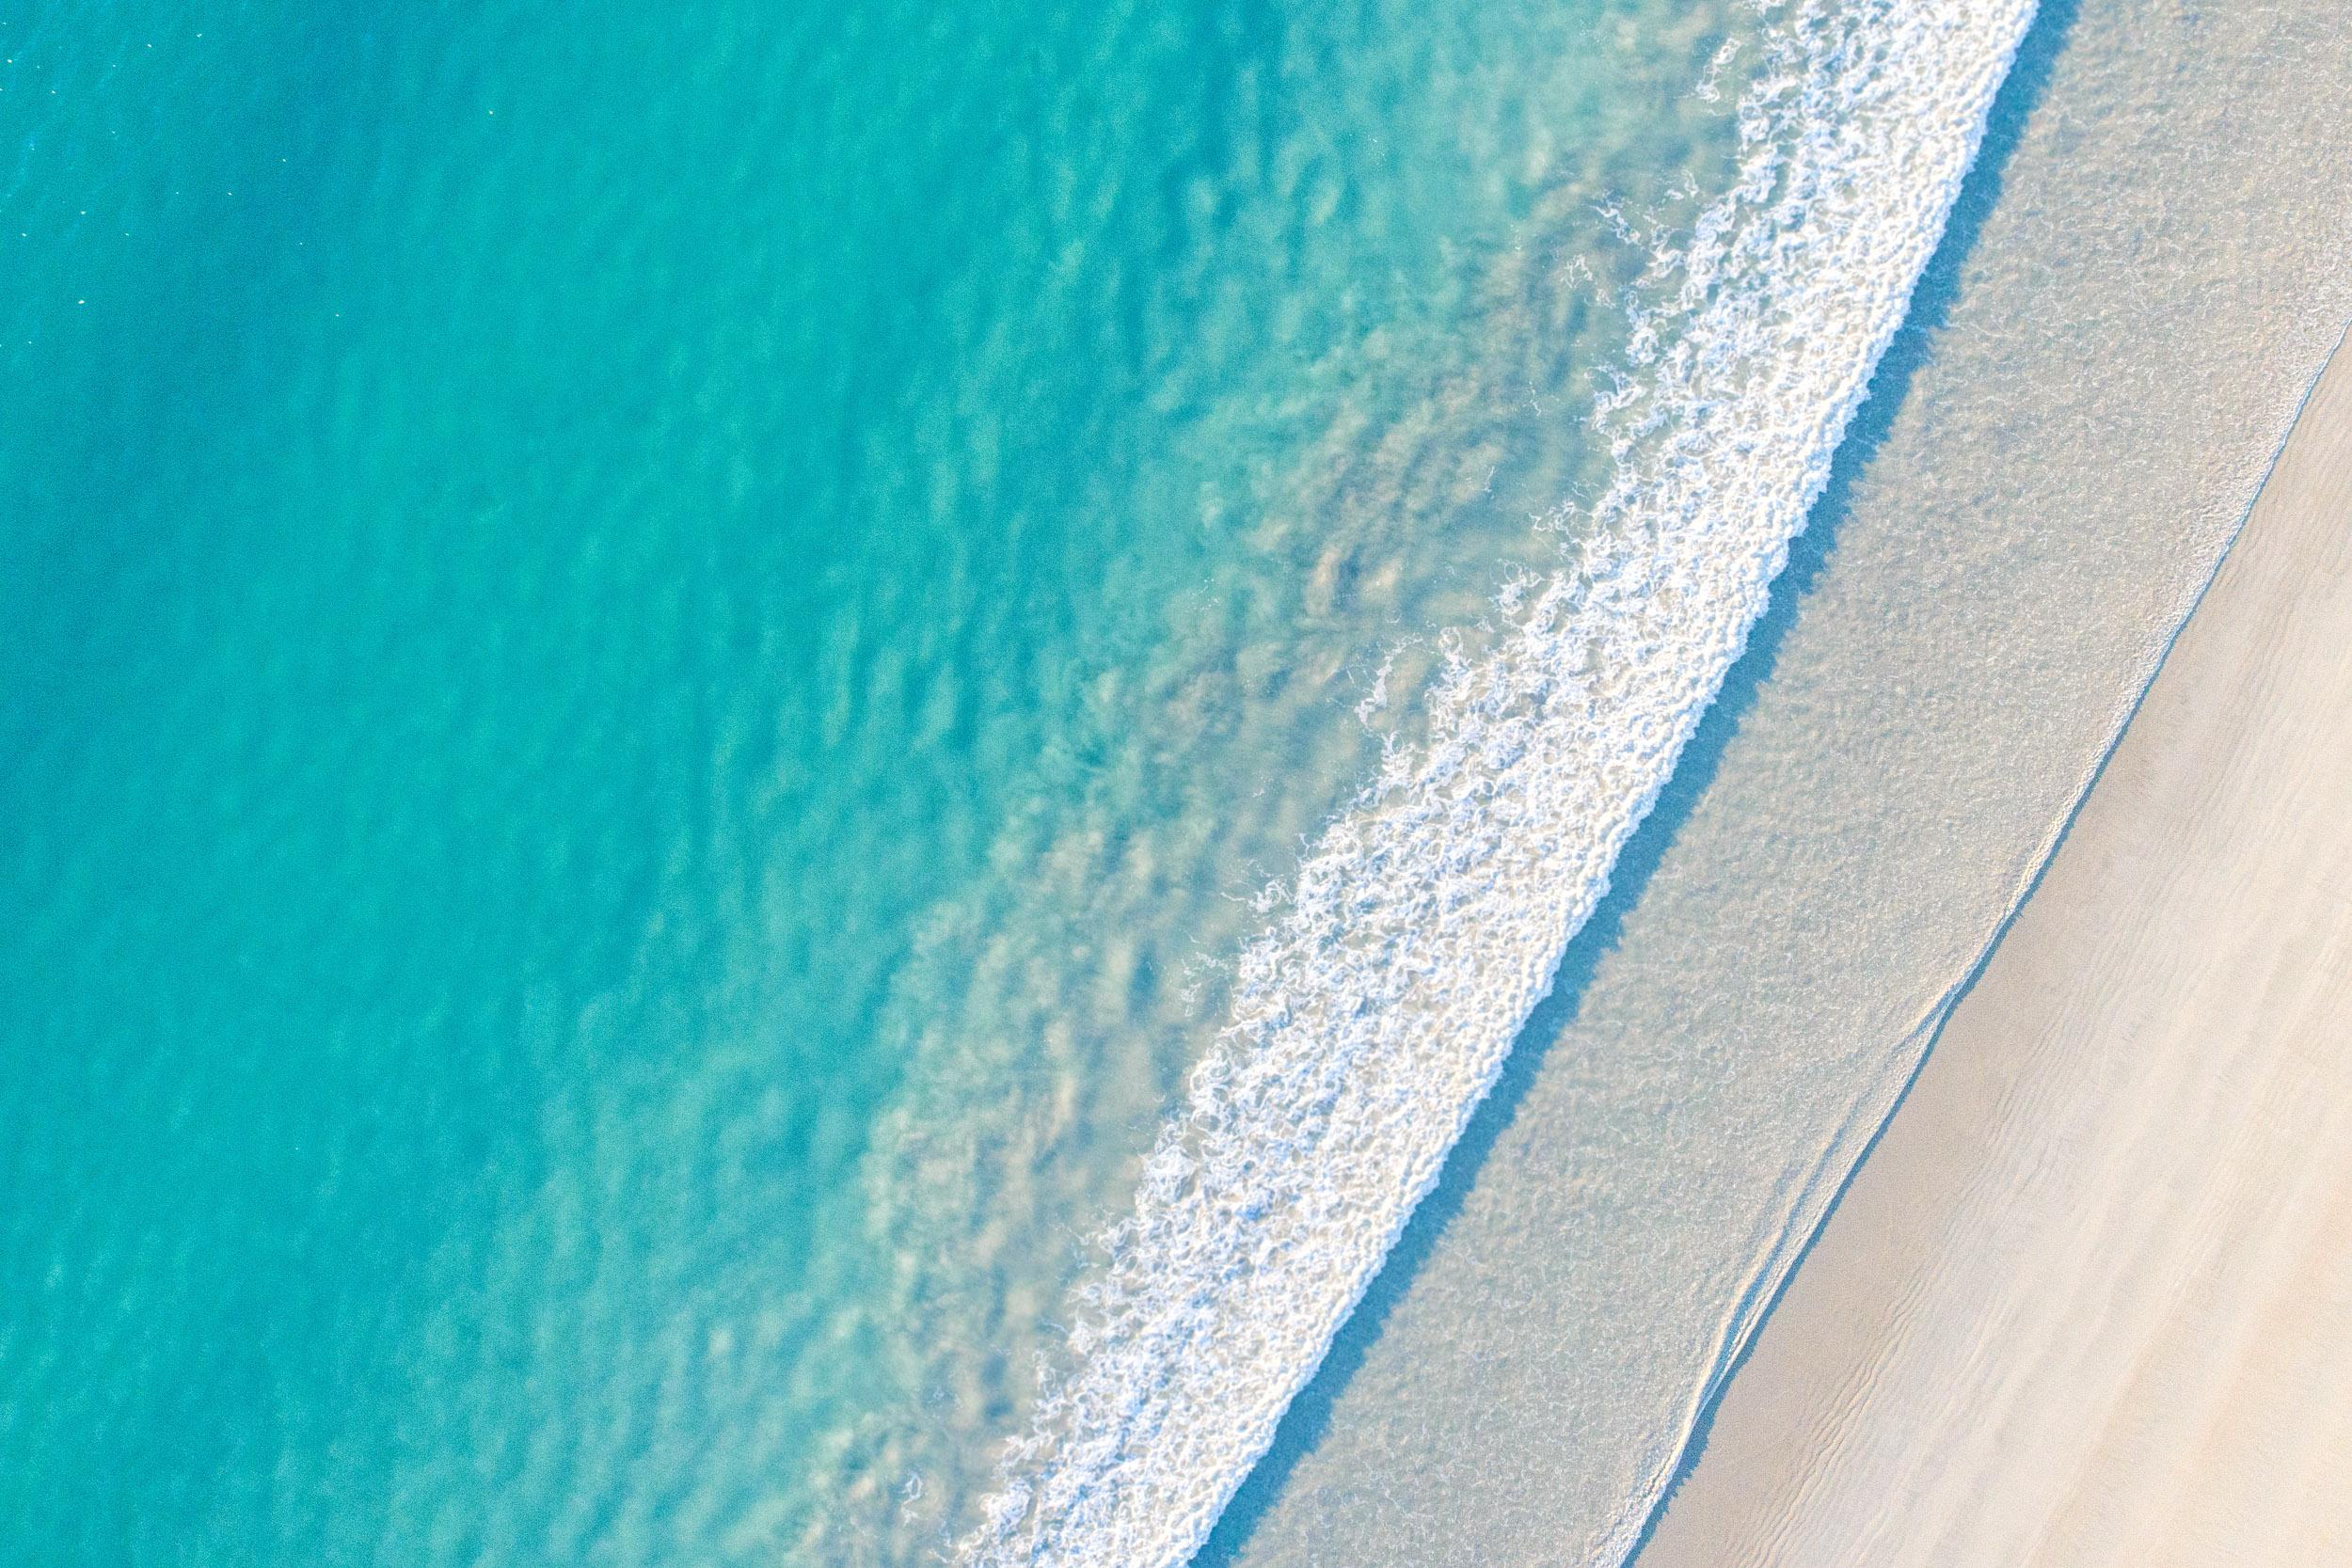 broome-western-australia-beach-aerial.jpg